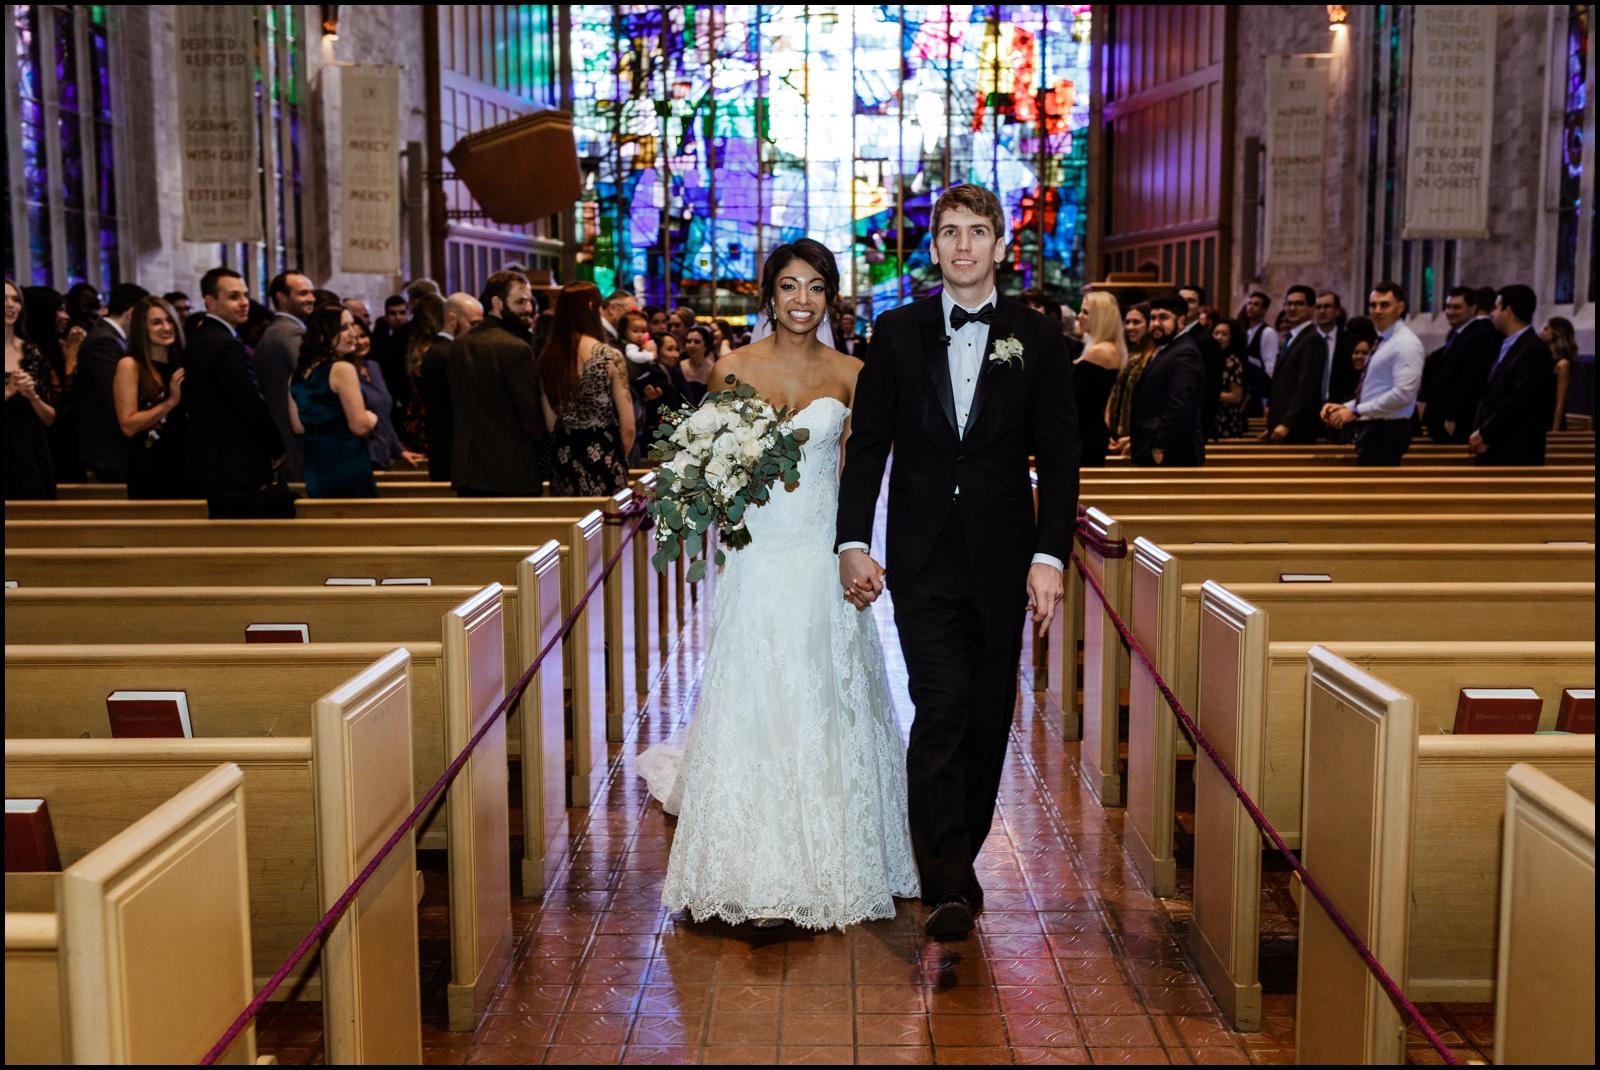 Chicago Wedding- Alice Millar Chapel Ceremony, London House Reception_0080.jpg